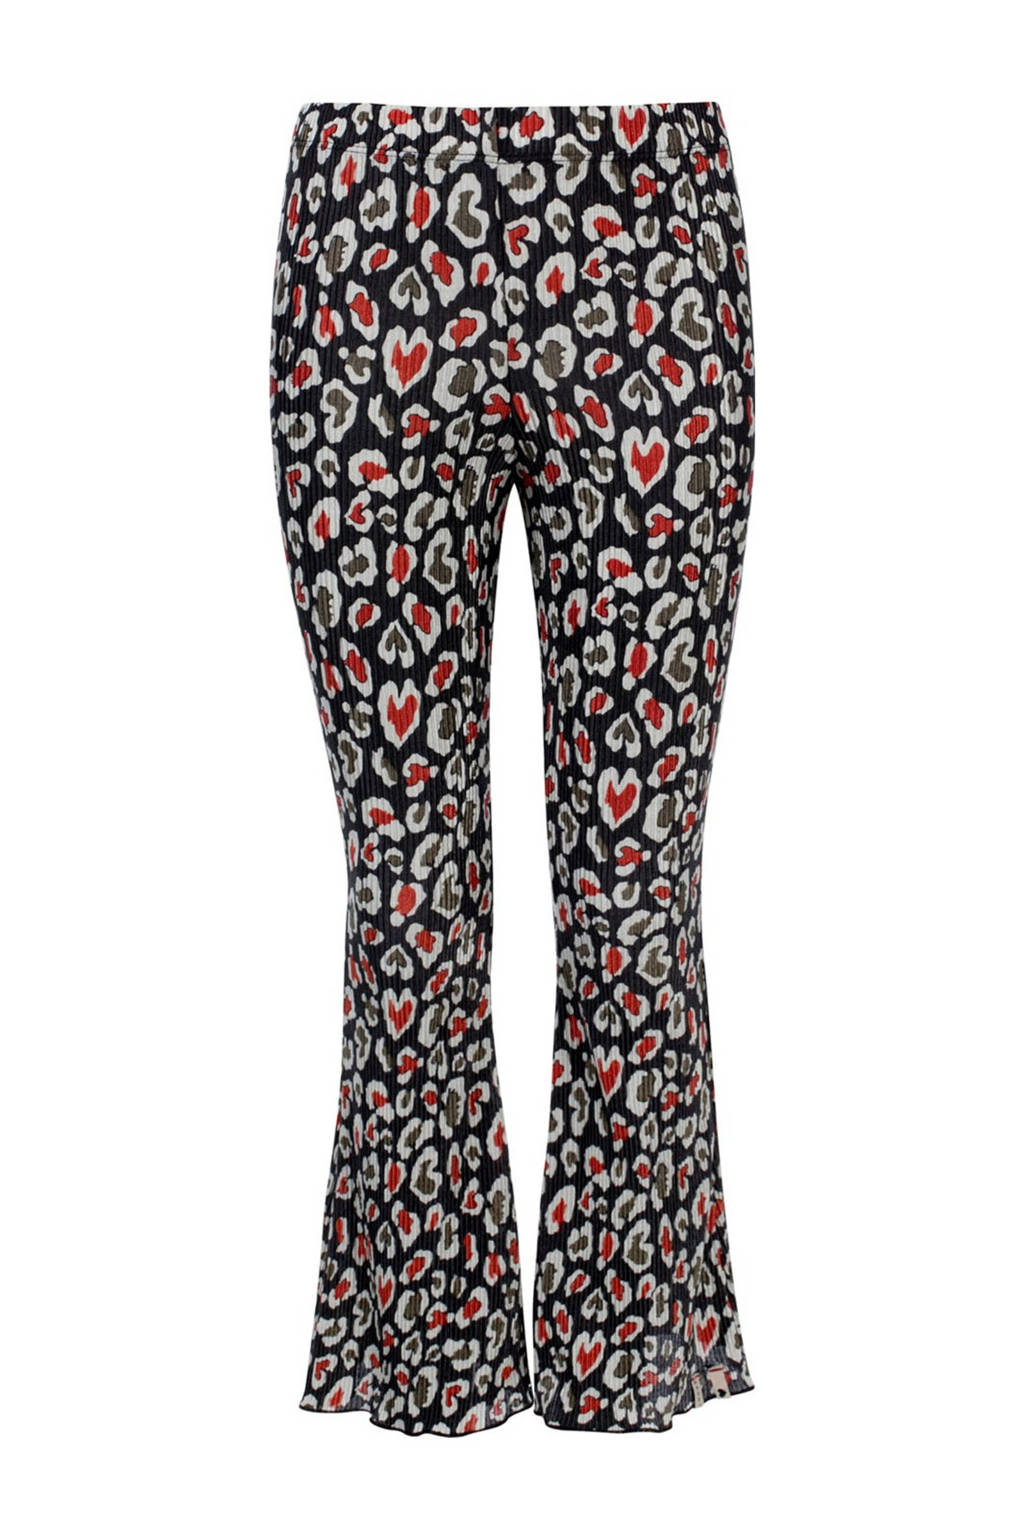 LOOXS 10sixteen flared broek met dierenprint zwart/rood/wit, Zwart/rood/wit